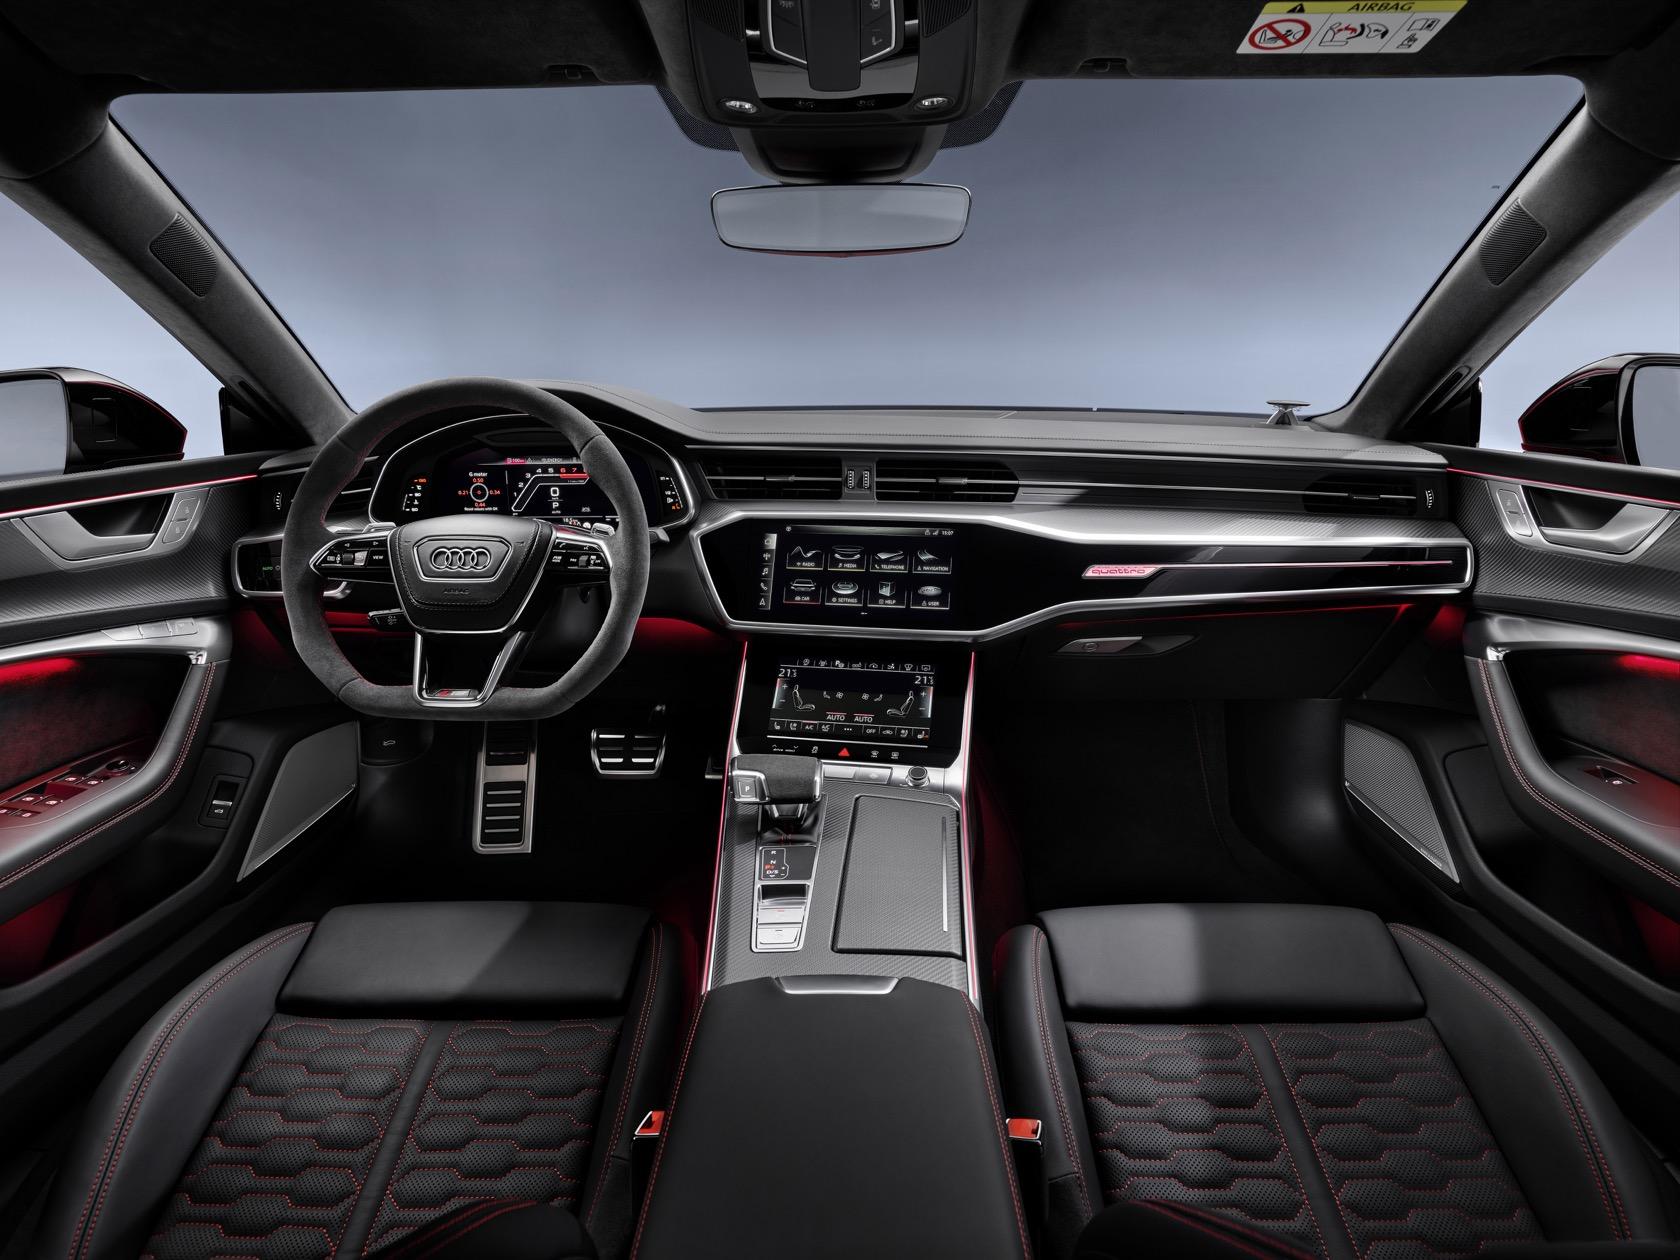 Audi Rs7 0-60 >> 2020 Audi Rs7 Sportback Puts 600hp V8 In Seductive Four Door